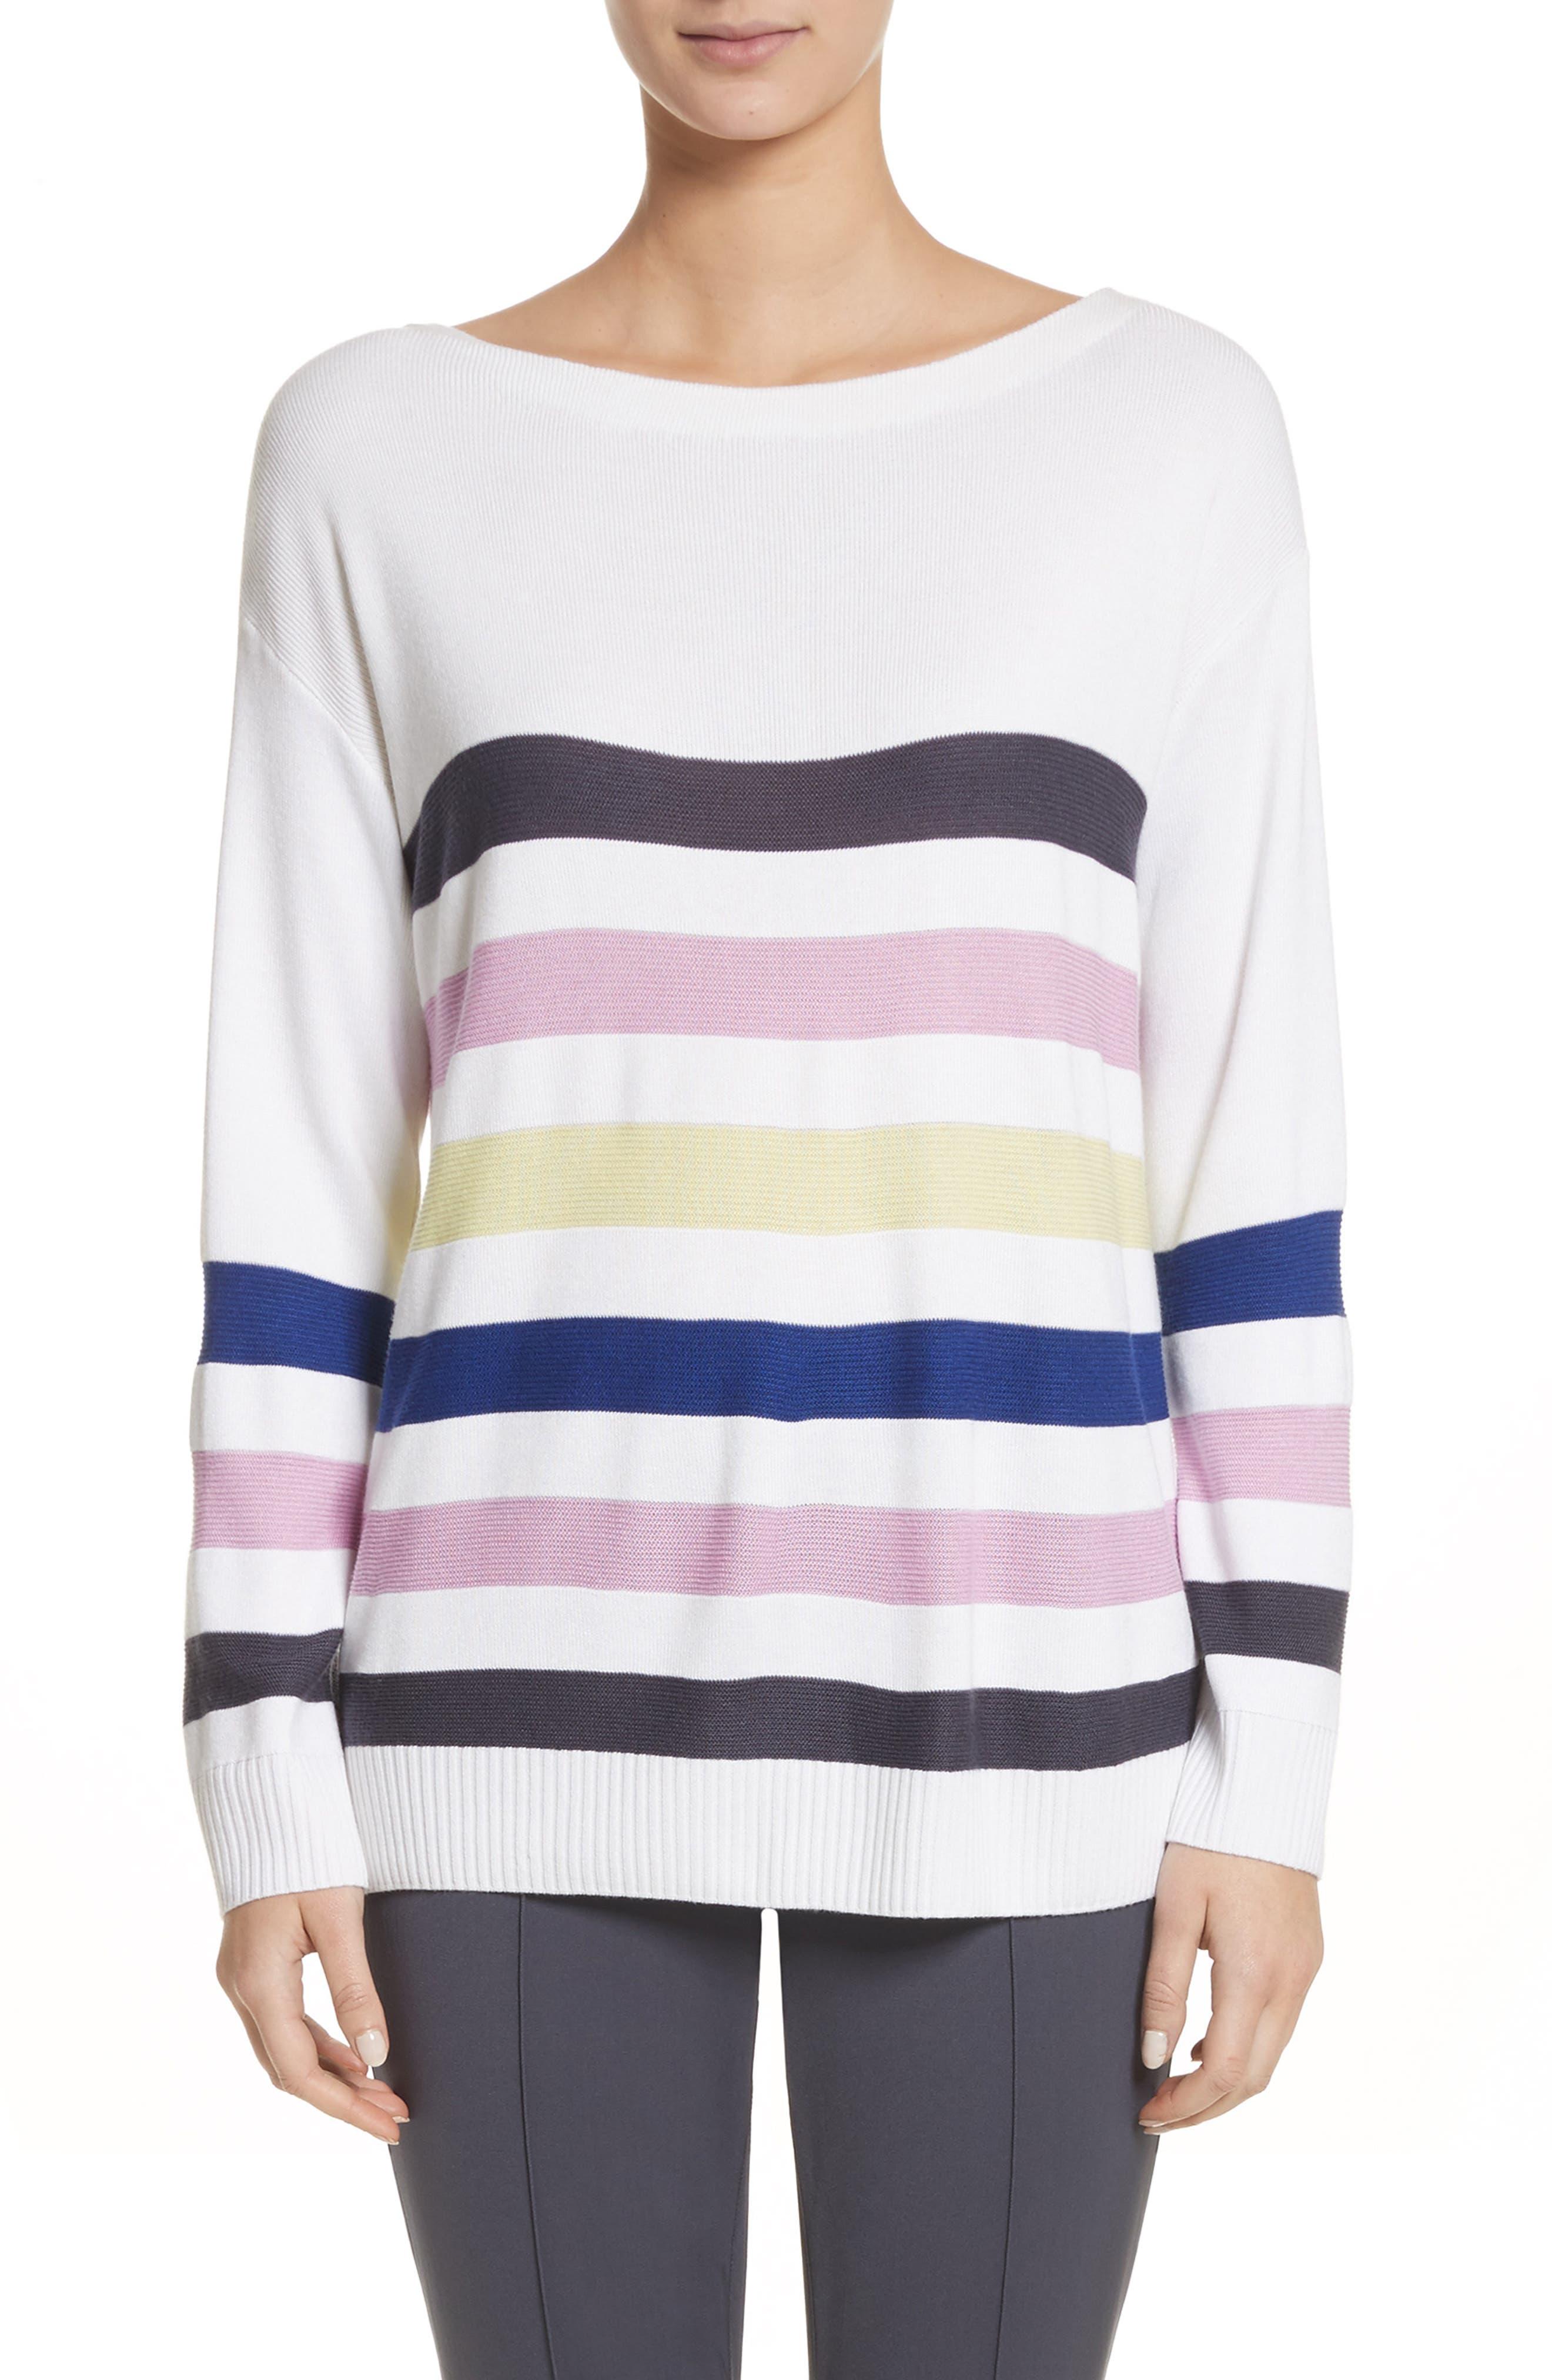 Links Stripe Knit Sweater,                             Main thumbnail 1, color,                             100